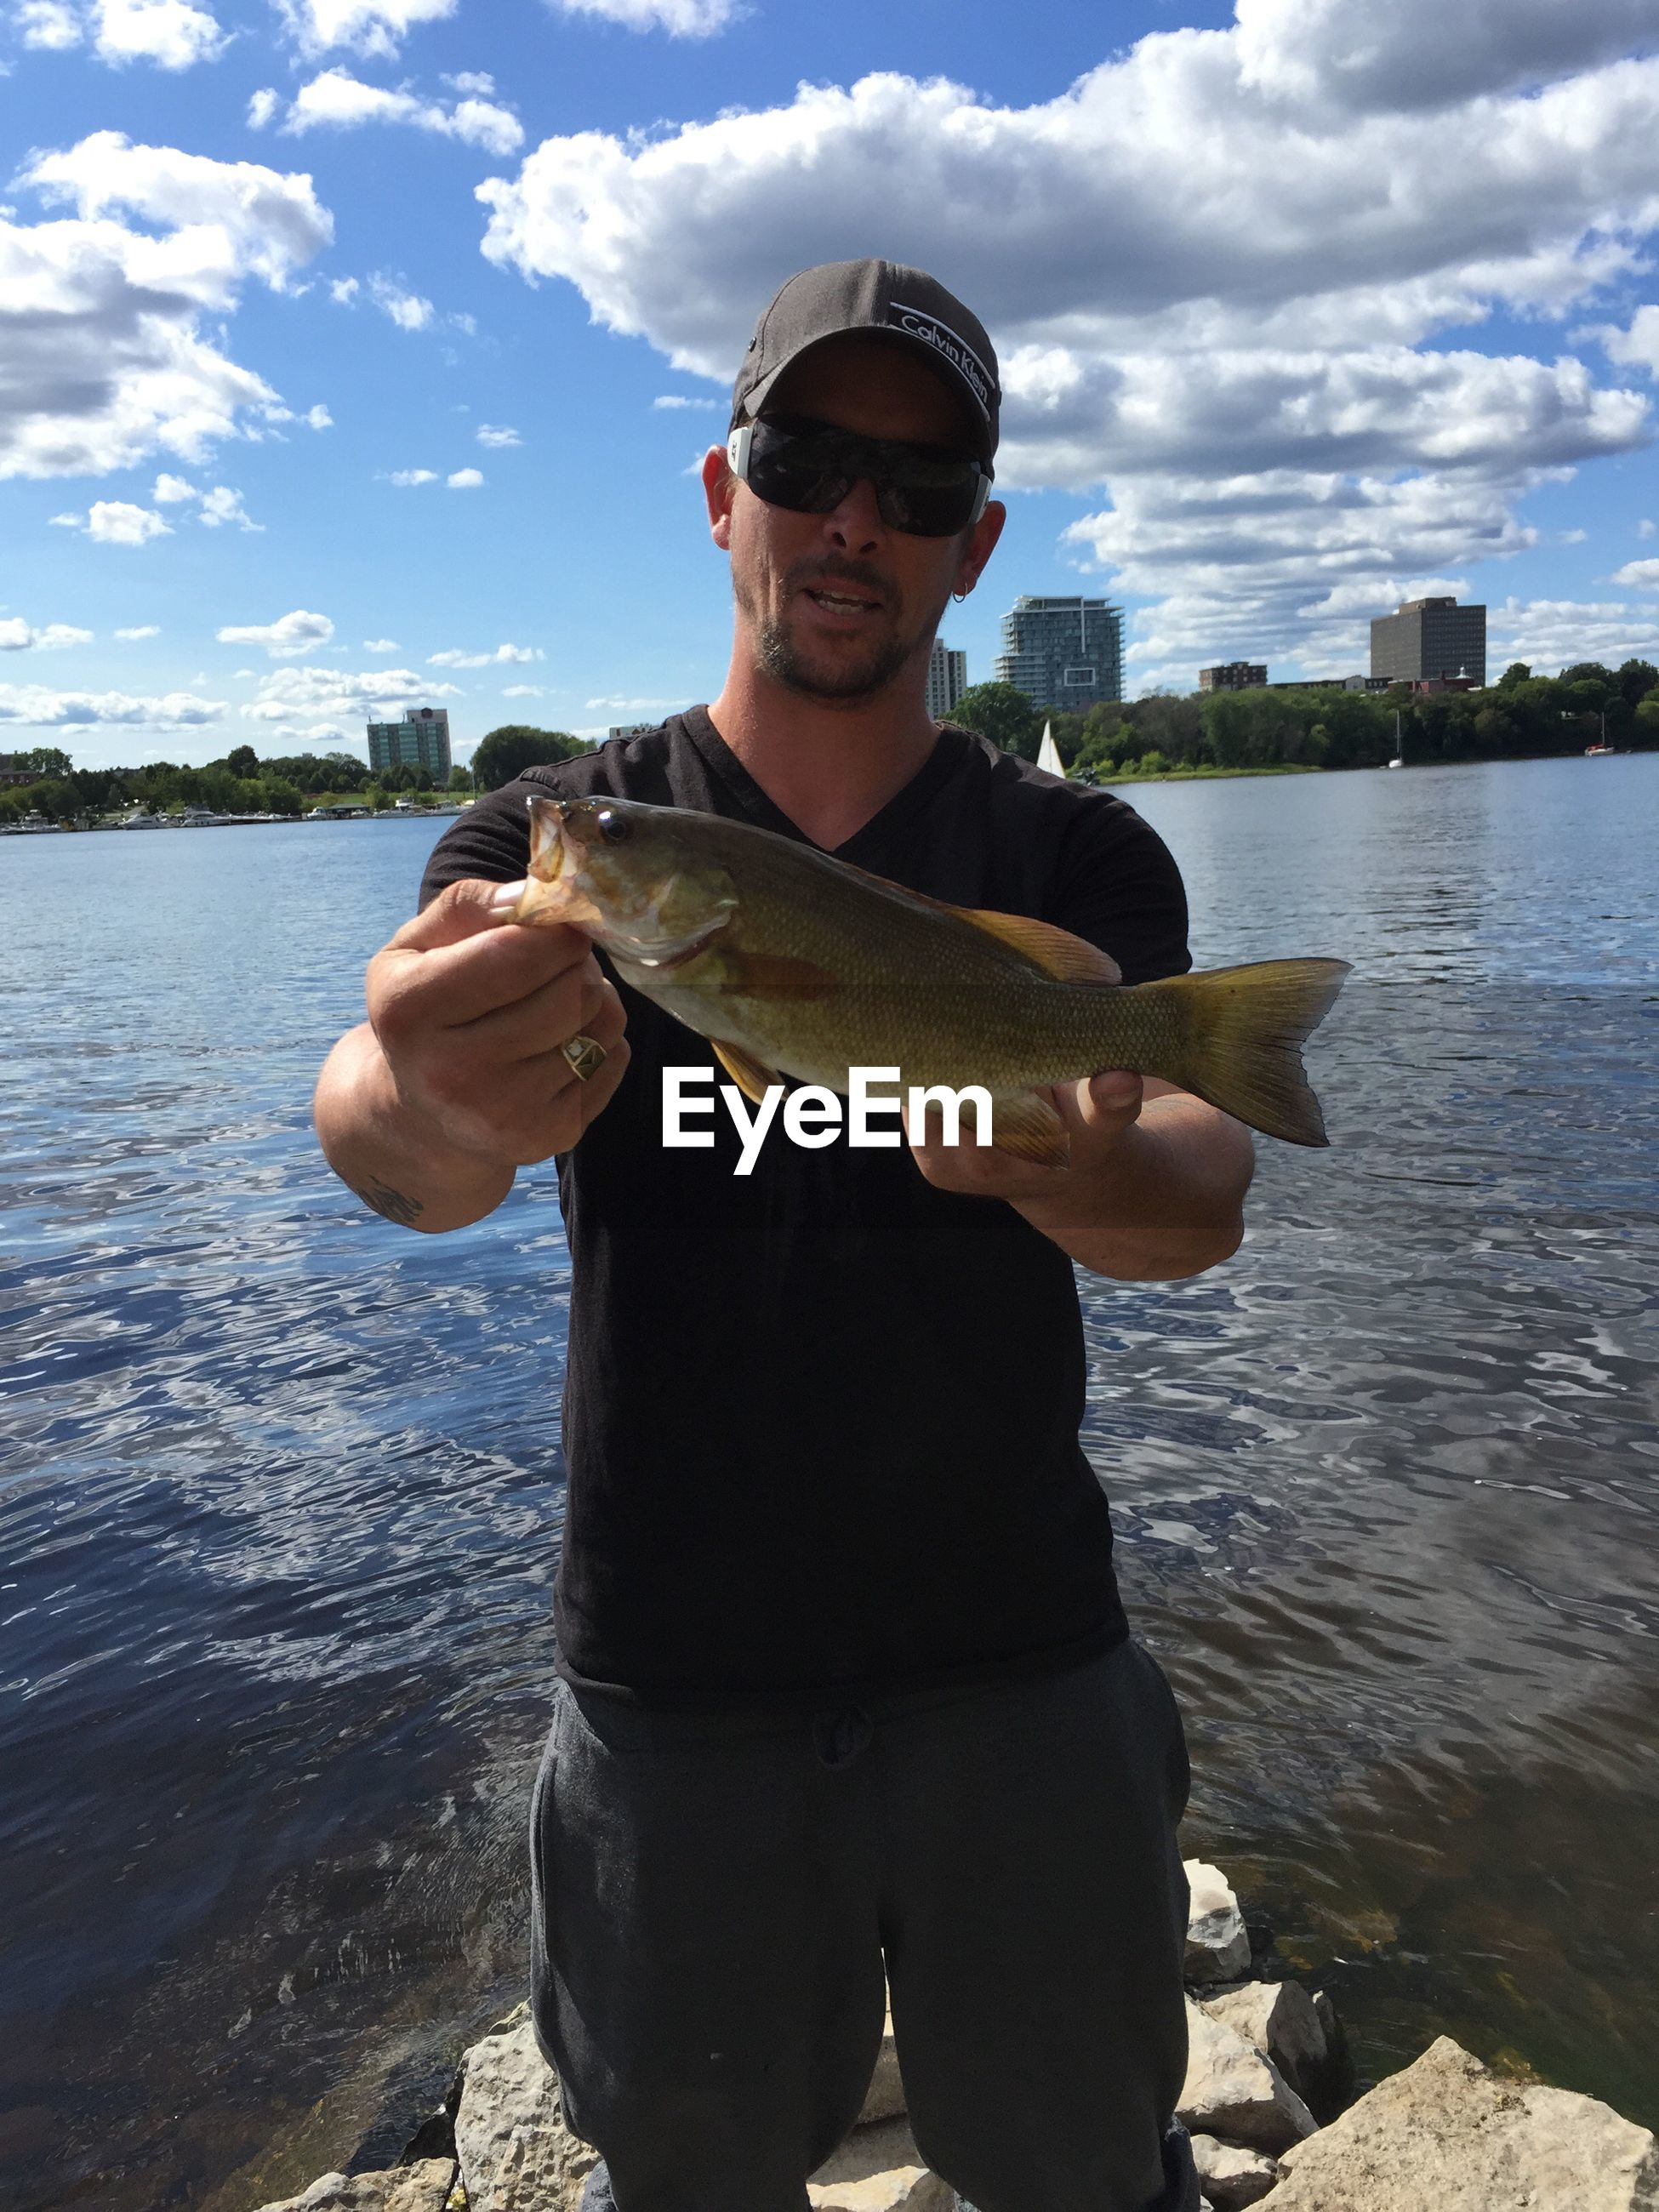 PORTRAIT OF MAN HOLDING FISH AT LAKE